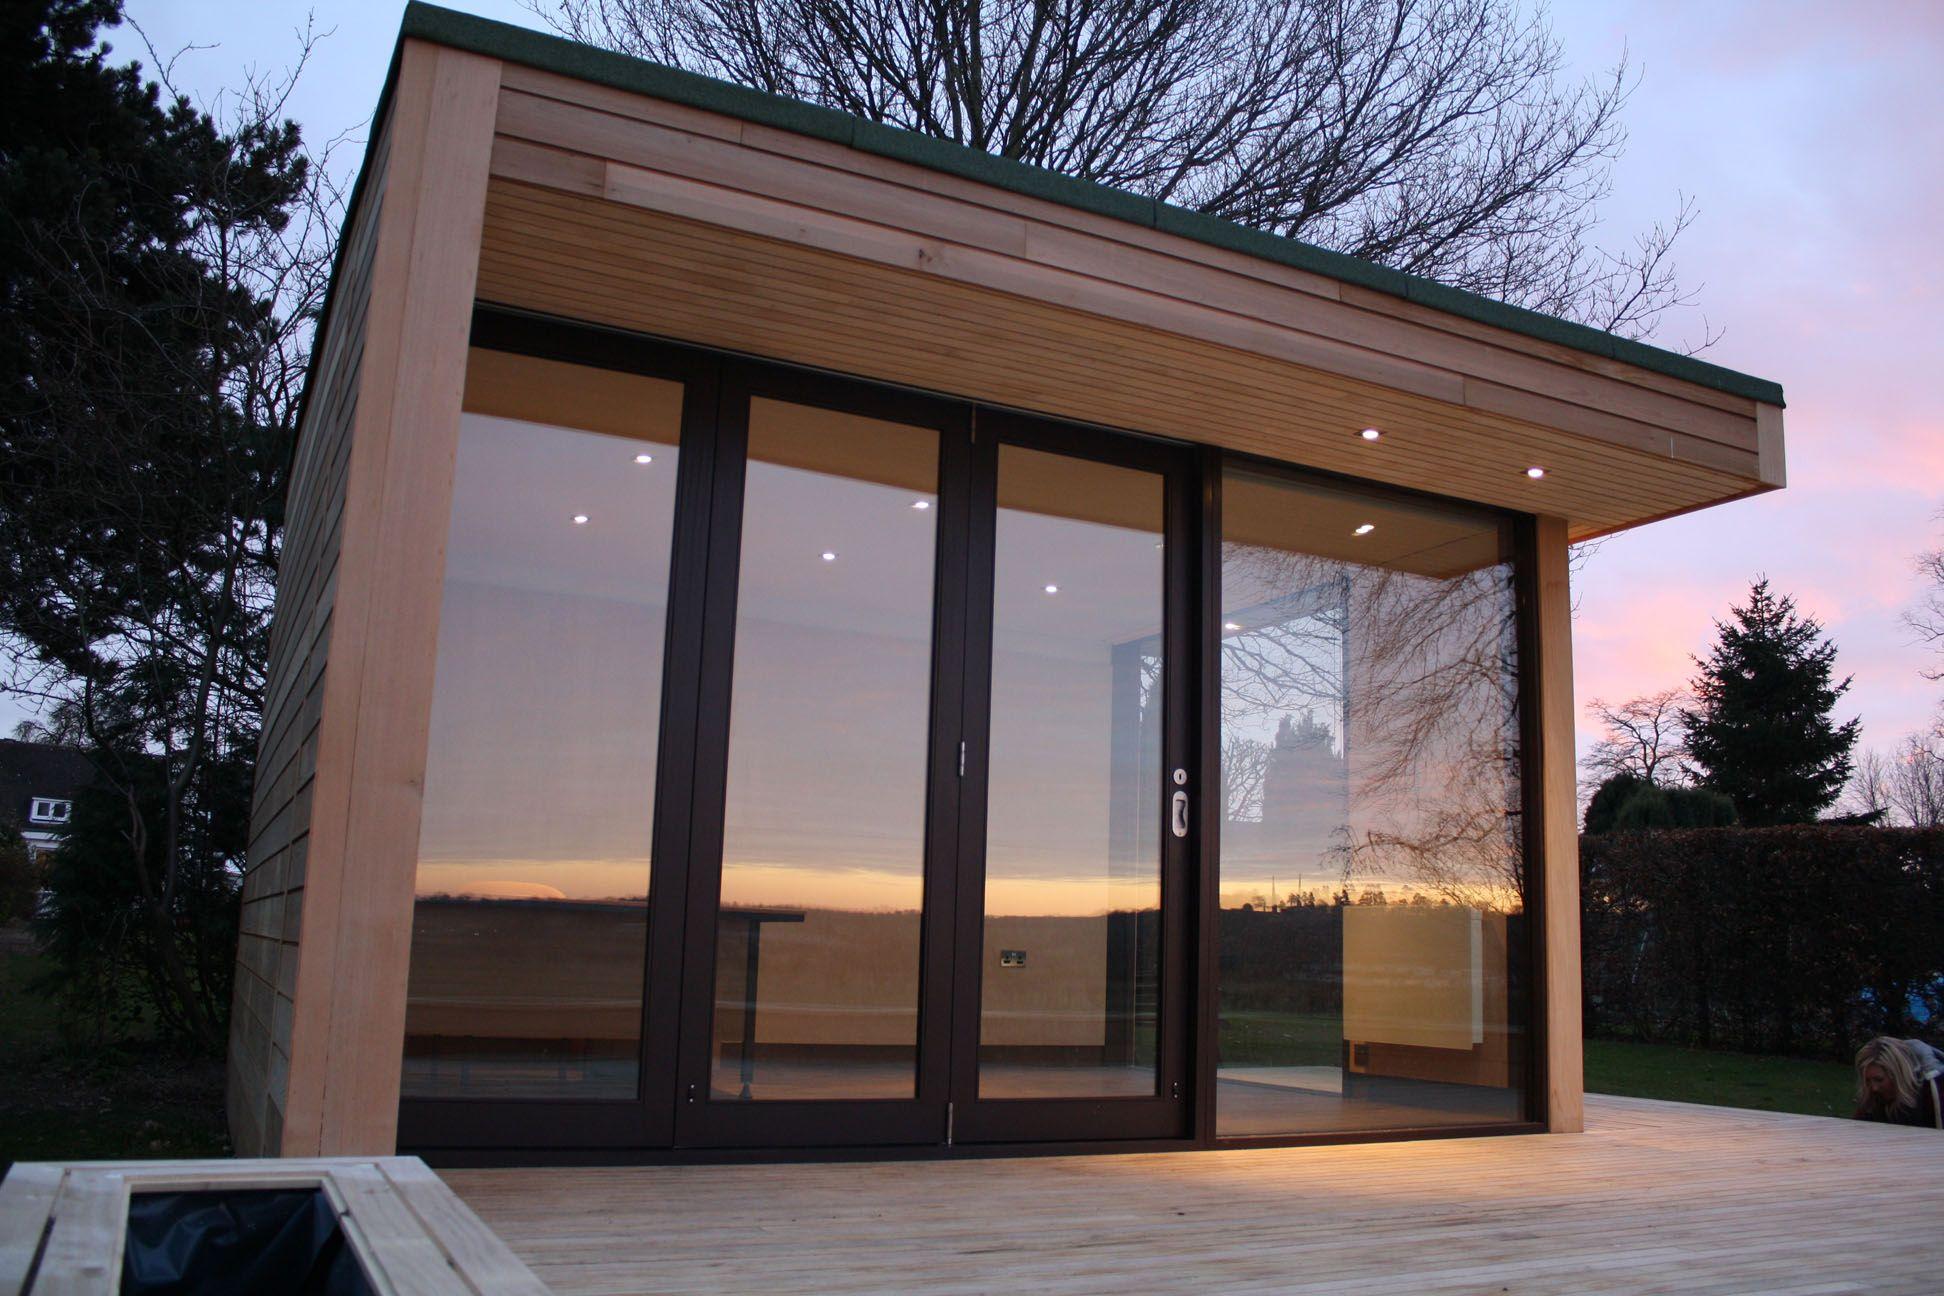 init studios garden office. Init Studios Garden Office. Rooms | In.it.studios Http:/ Office